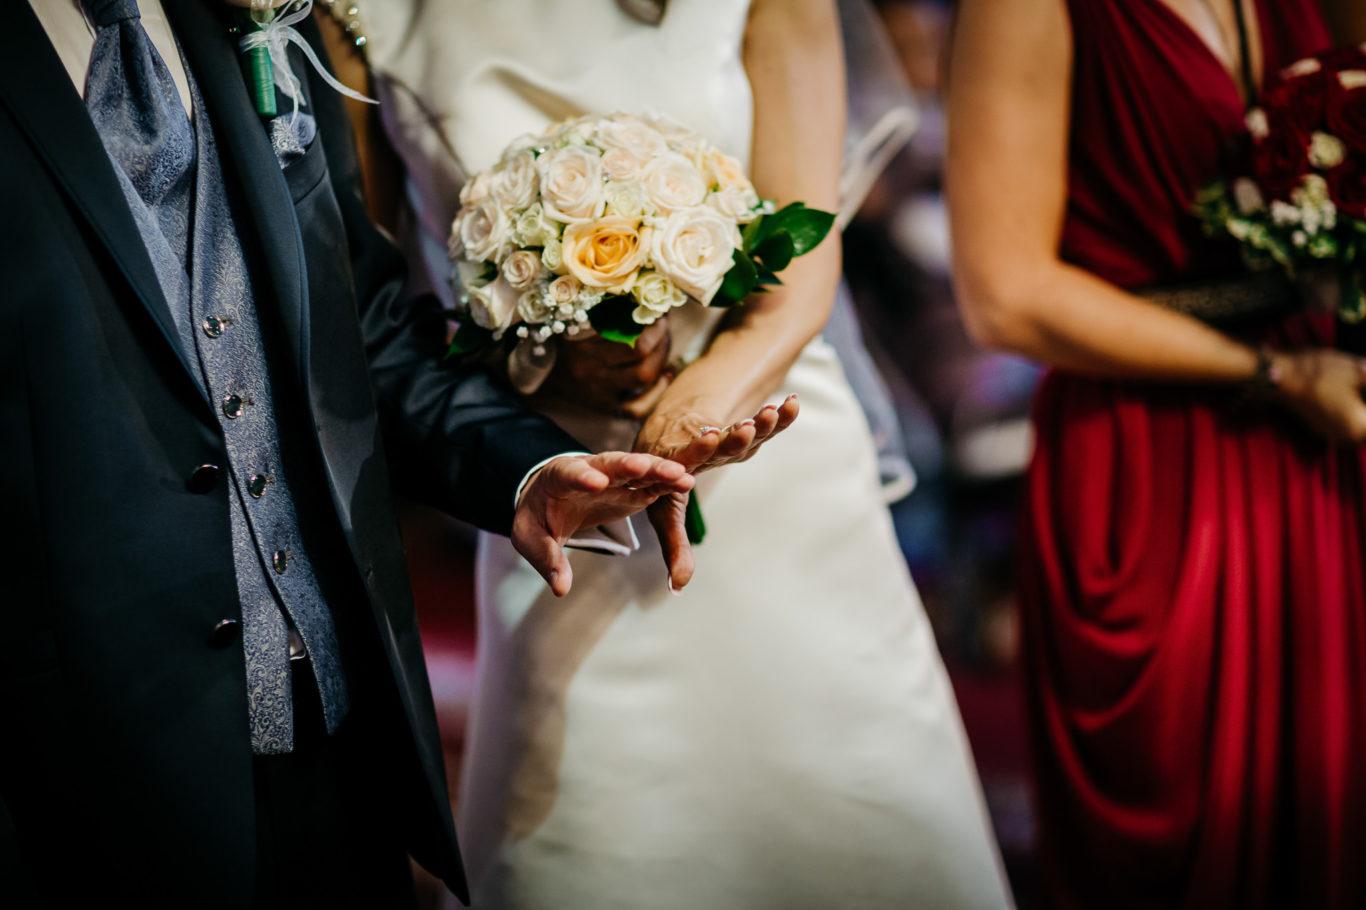 0425-fotografie-nunta-bucuresti-dana-radu-fotograf-ciprian-dumitrescu-cd2_7332